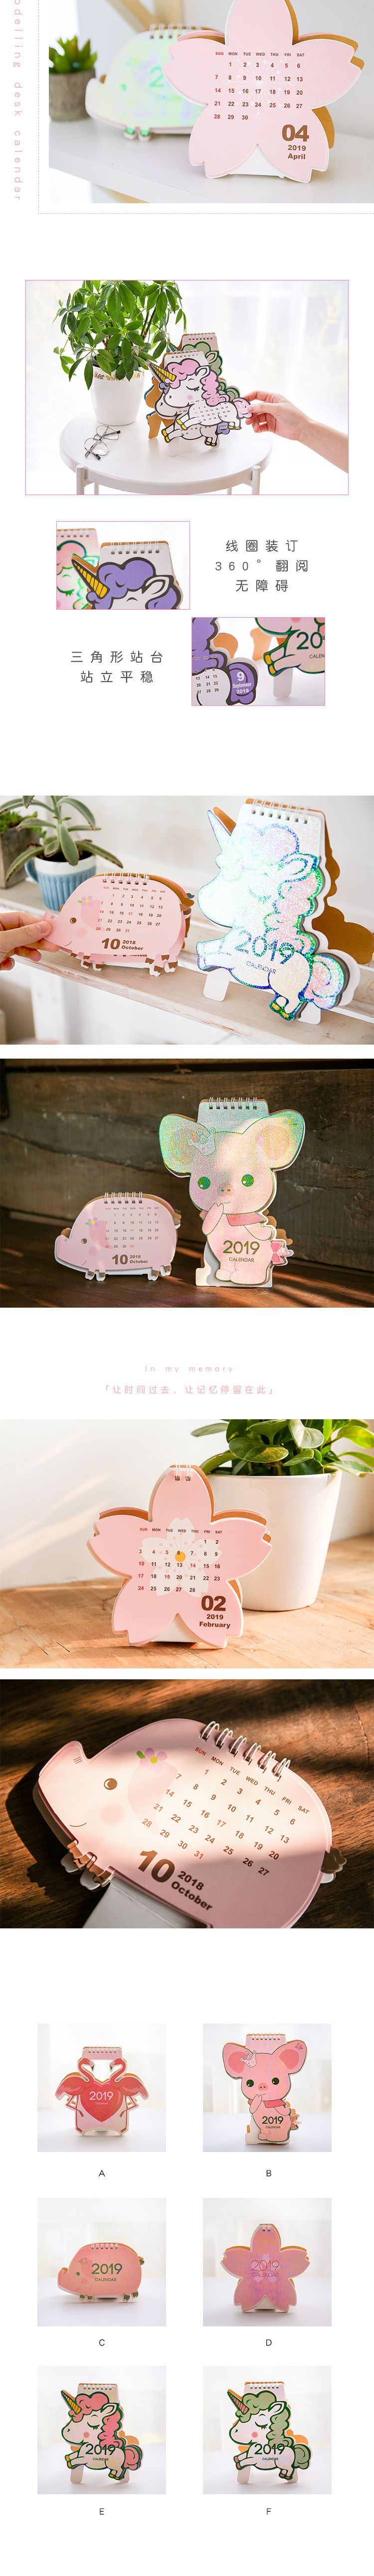 Calendar 2019 Cute Unicorn Flamingo Pig Laser Mini Table Desktop Calendar Agenda Organizer Daily Schedule Planner 2018.10~2019.12